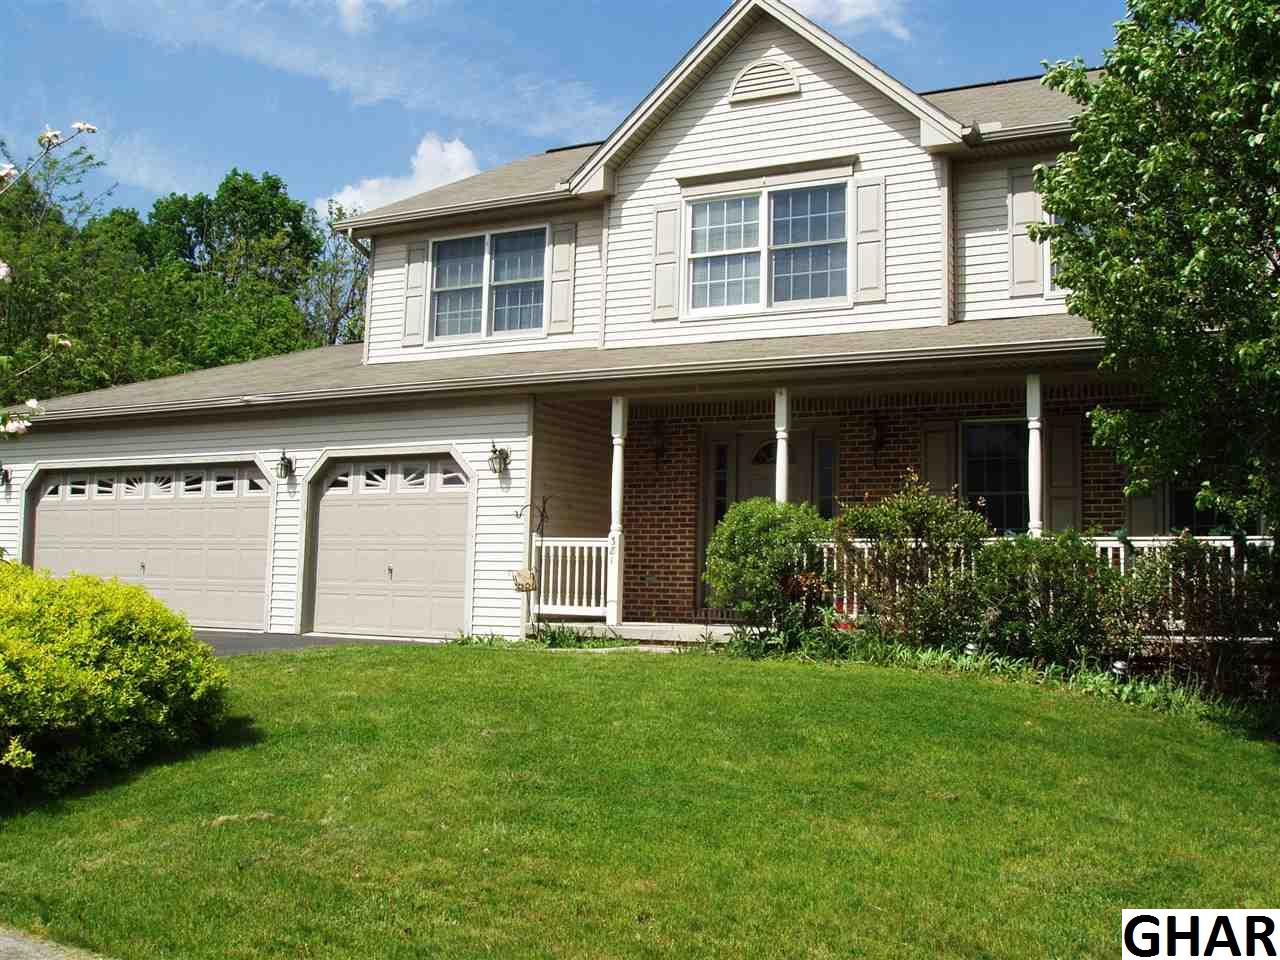 Rental Homes for Rent, ListingId:33379021, location: 381 Benyou Ln New Cumberland 17070